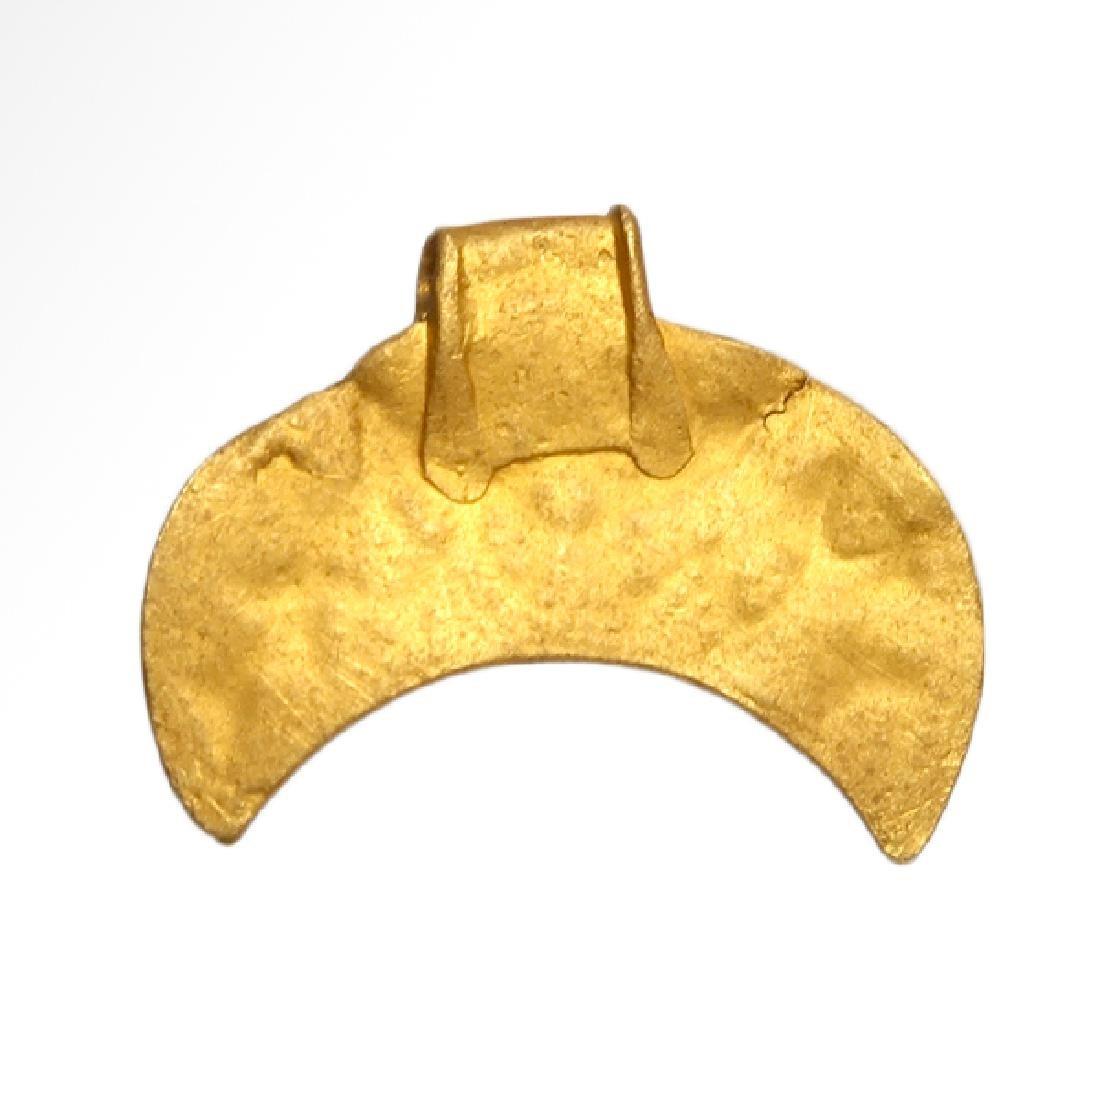 Viking Gold Lunar Pendant, c. 10th Century A.D. - 5